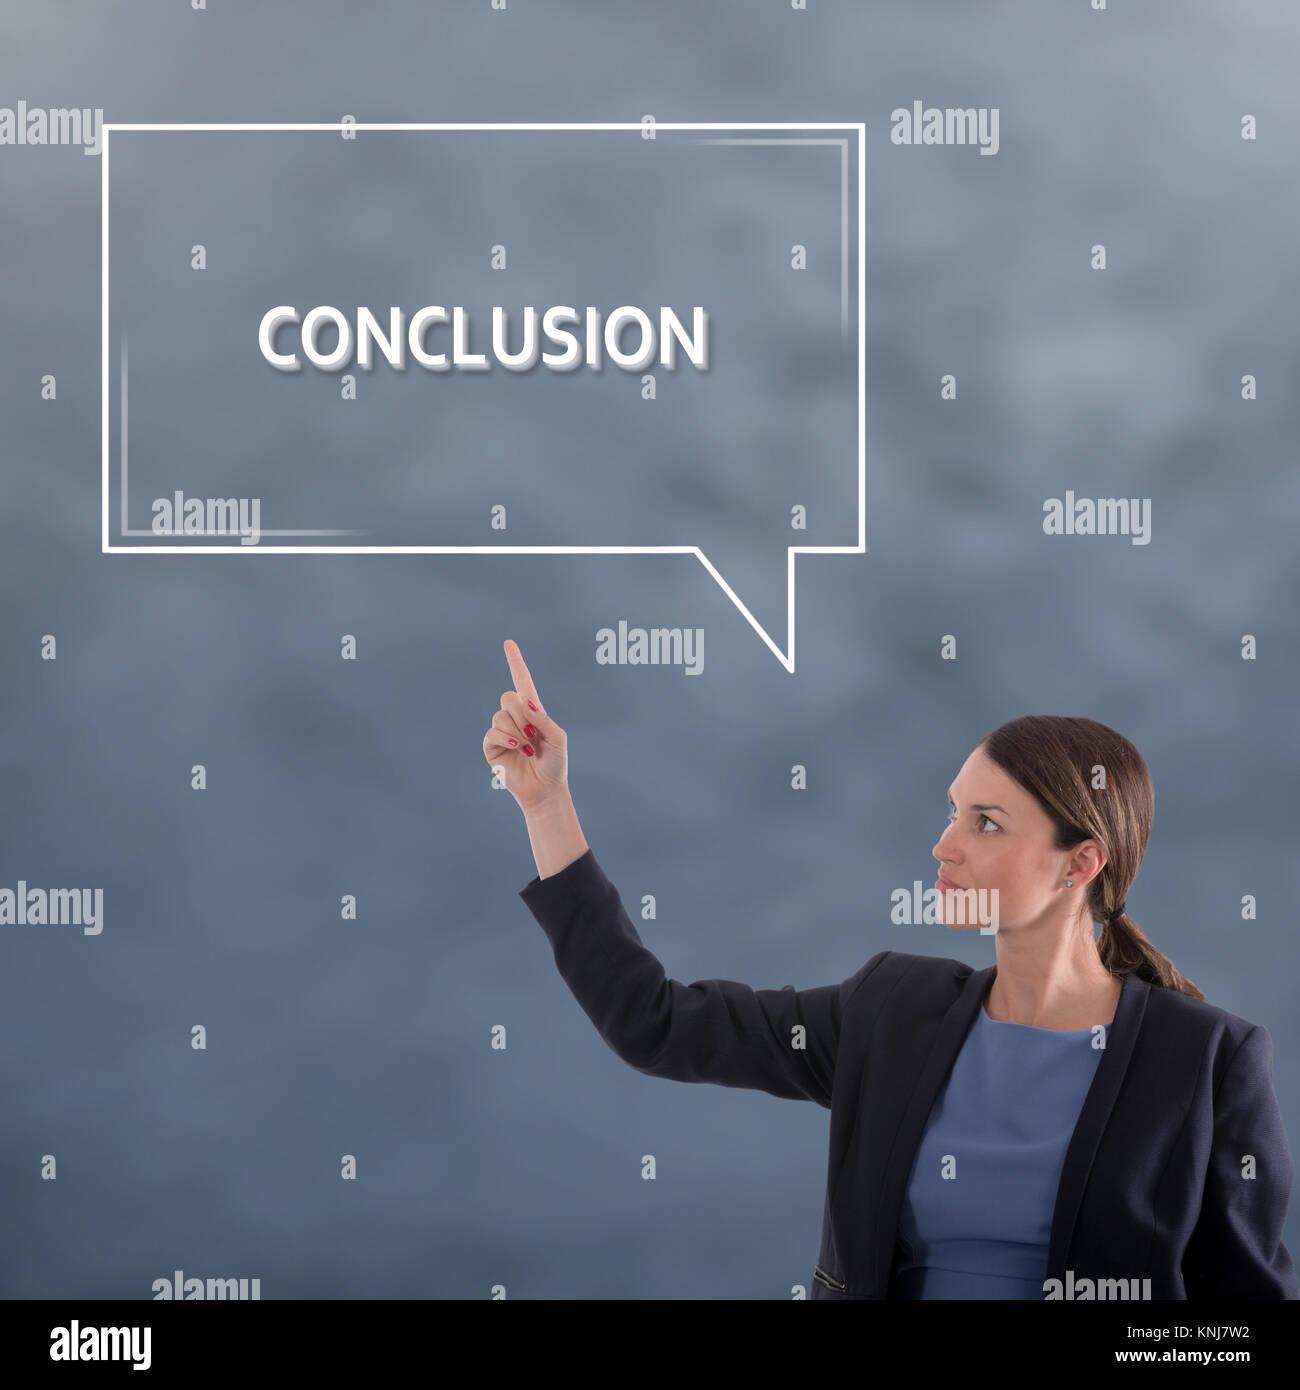 CONCLUSION Business Concept. Business Woman Graphic Concept - Stock Image